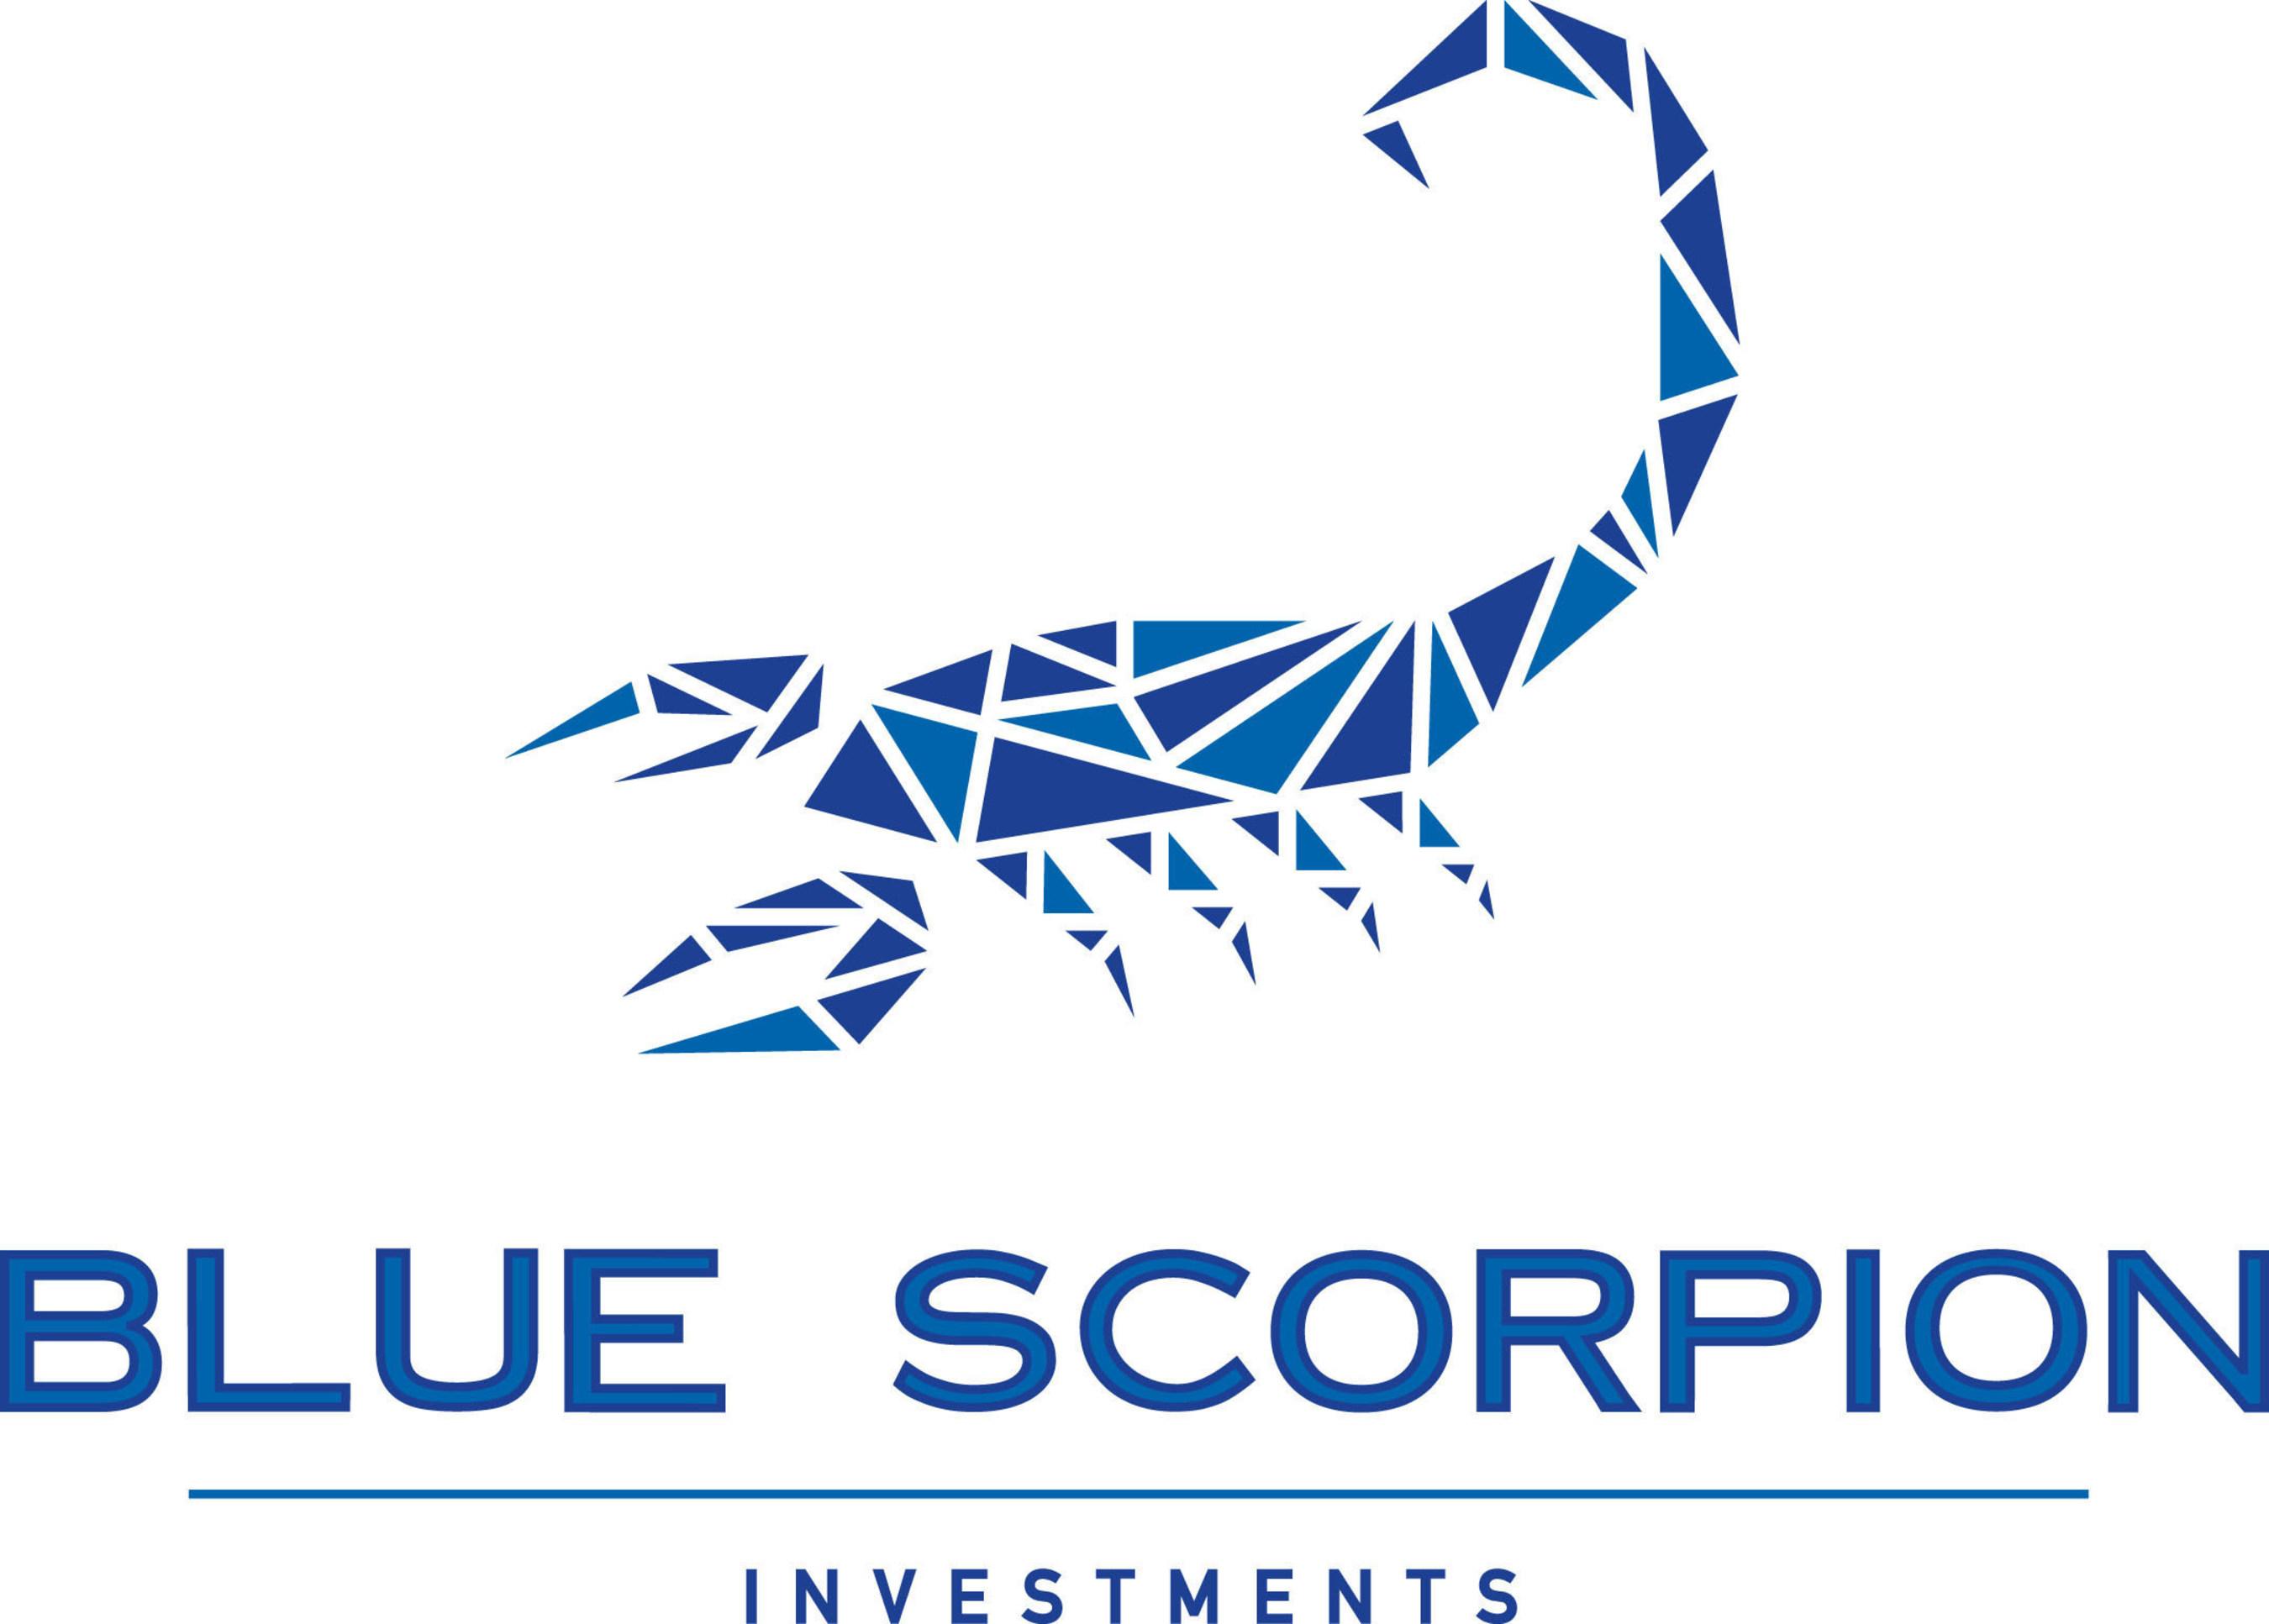 Blue Scorpion Investments